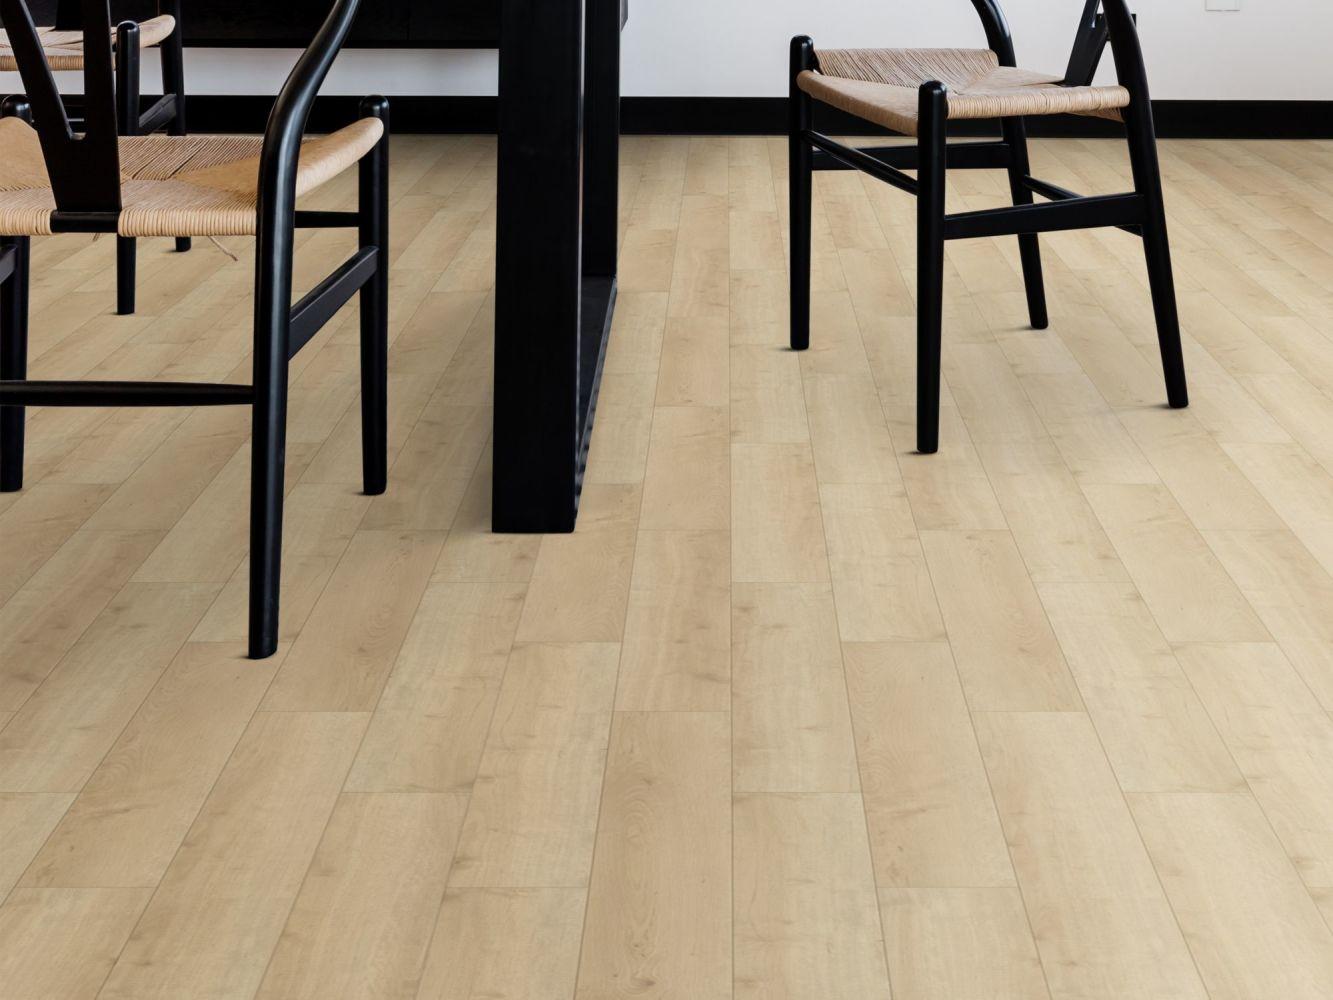 Shaw Floors Versalock Laminate Rarity Delicate Maple 01029_HL448